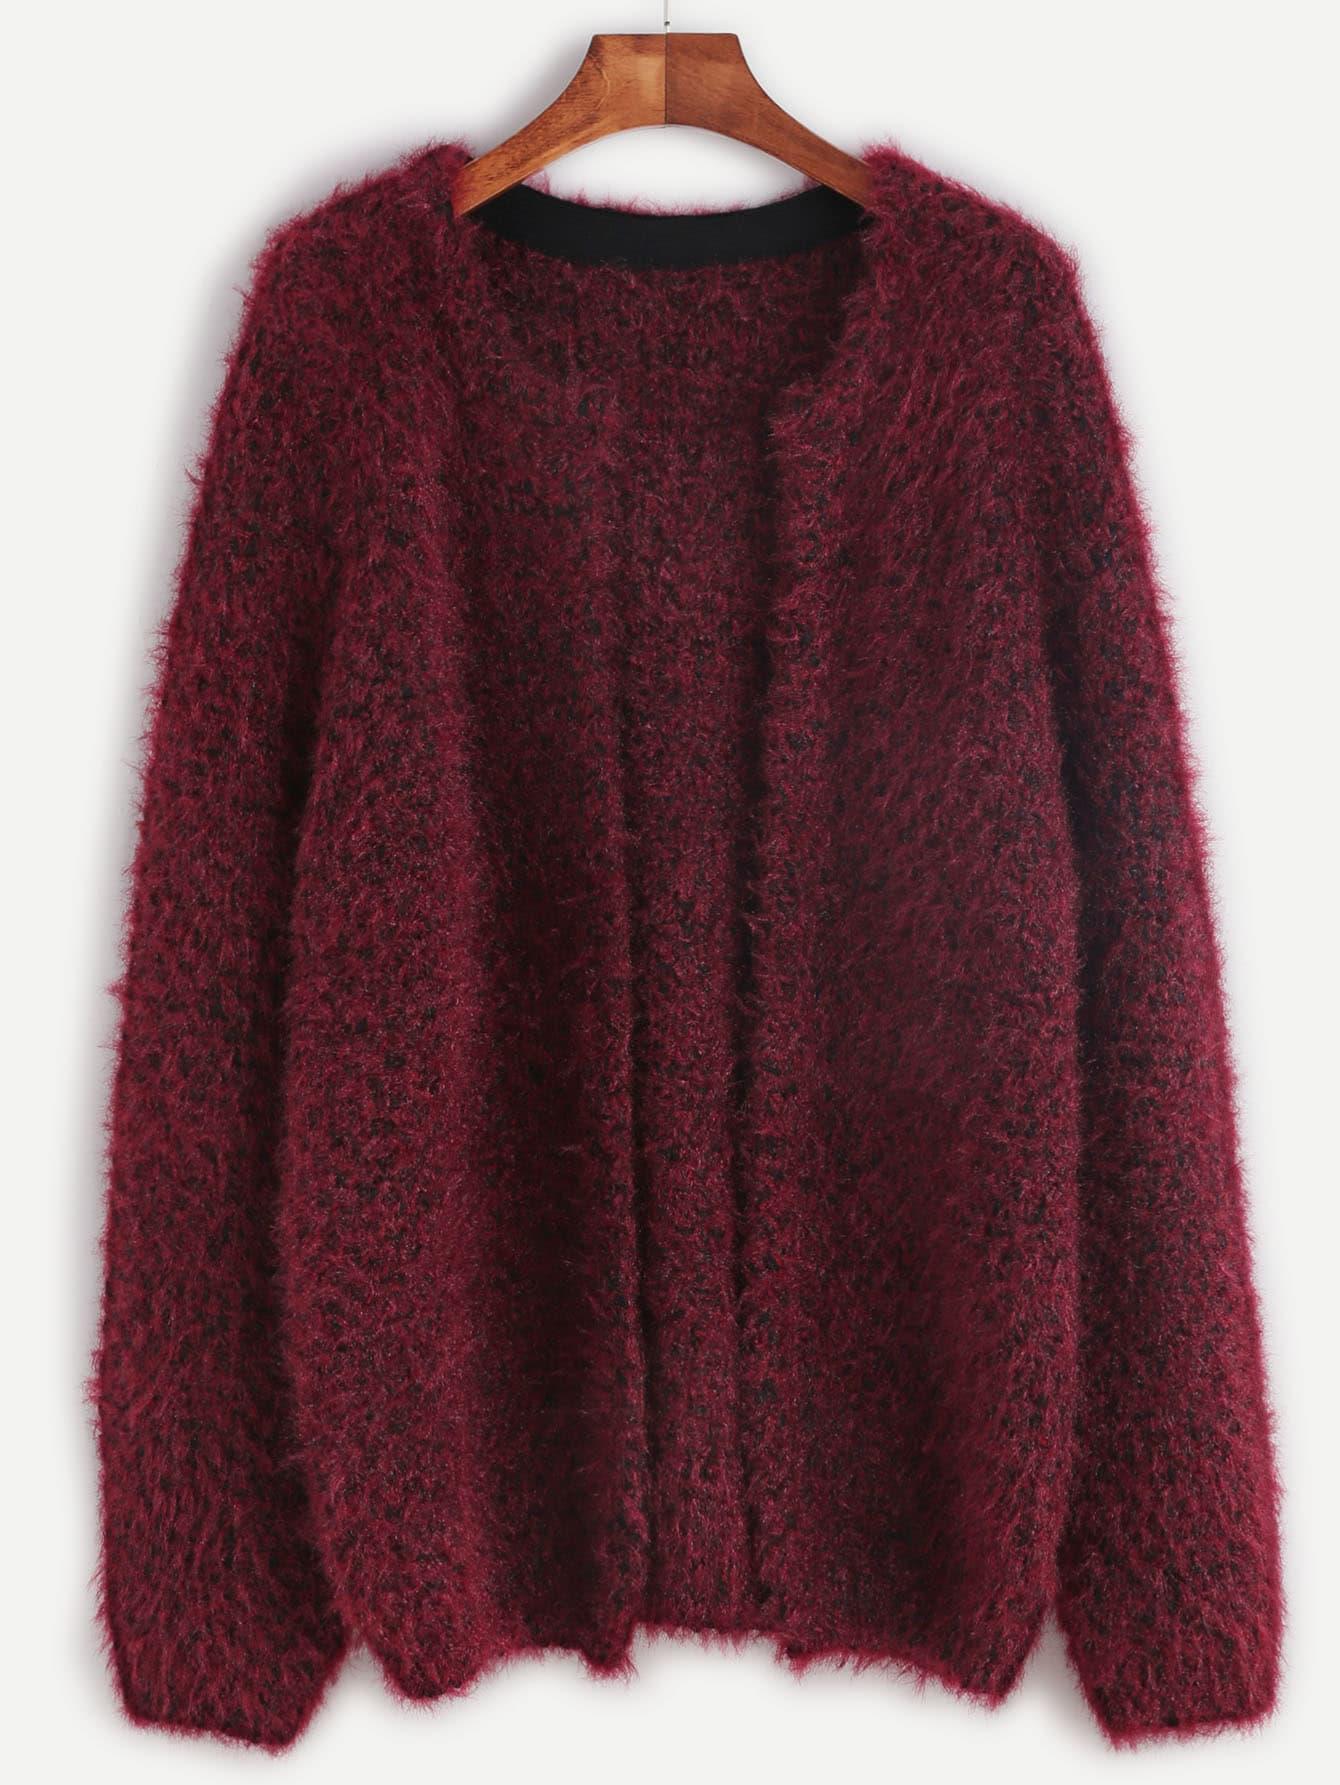 sweater161020457_2